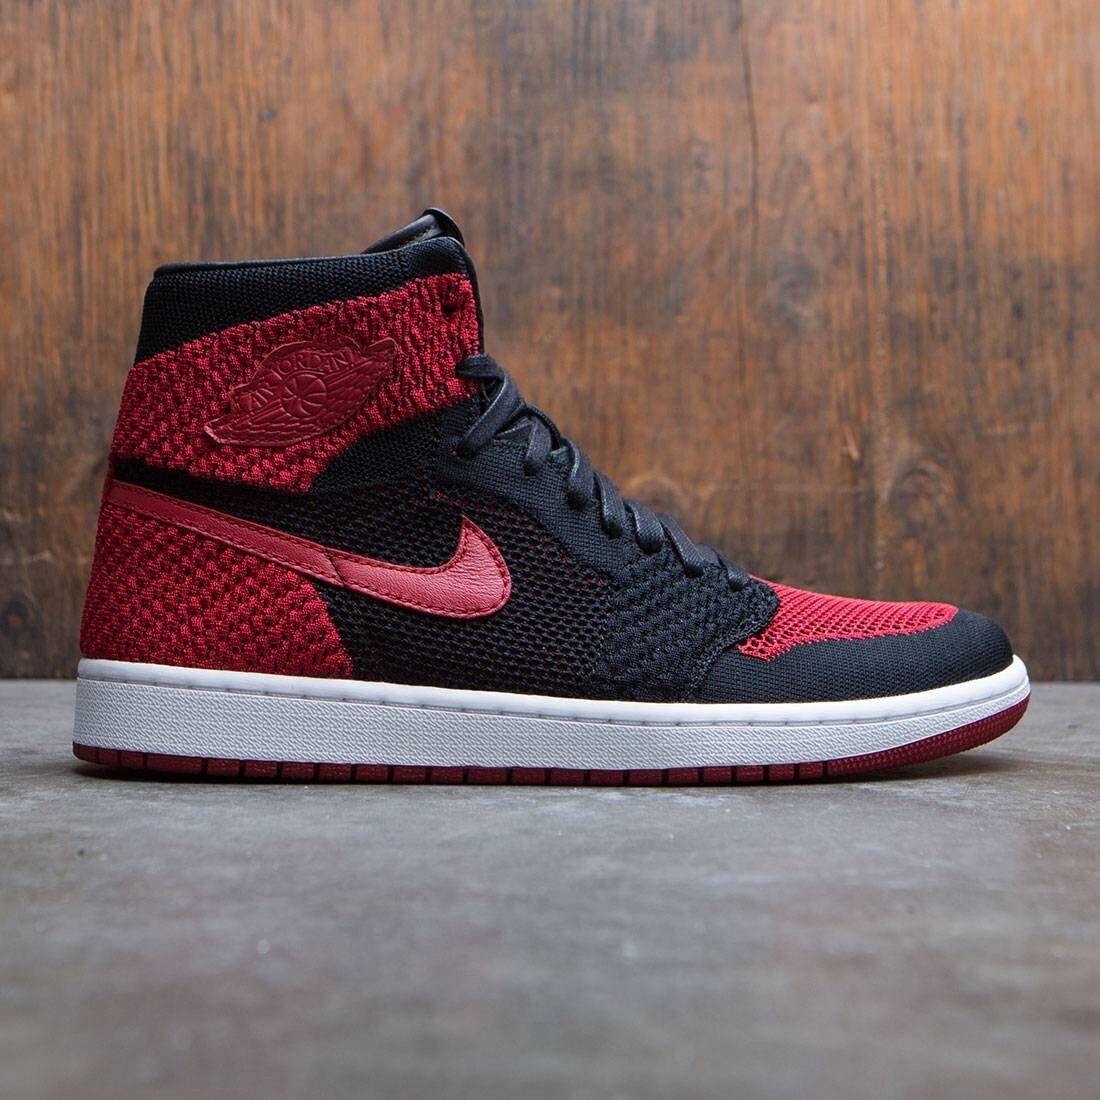 Nike air jordan 1 'alto og flyknit allevati vietato dimensioni 919704-001 royal